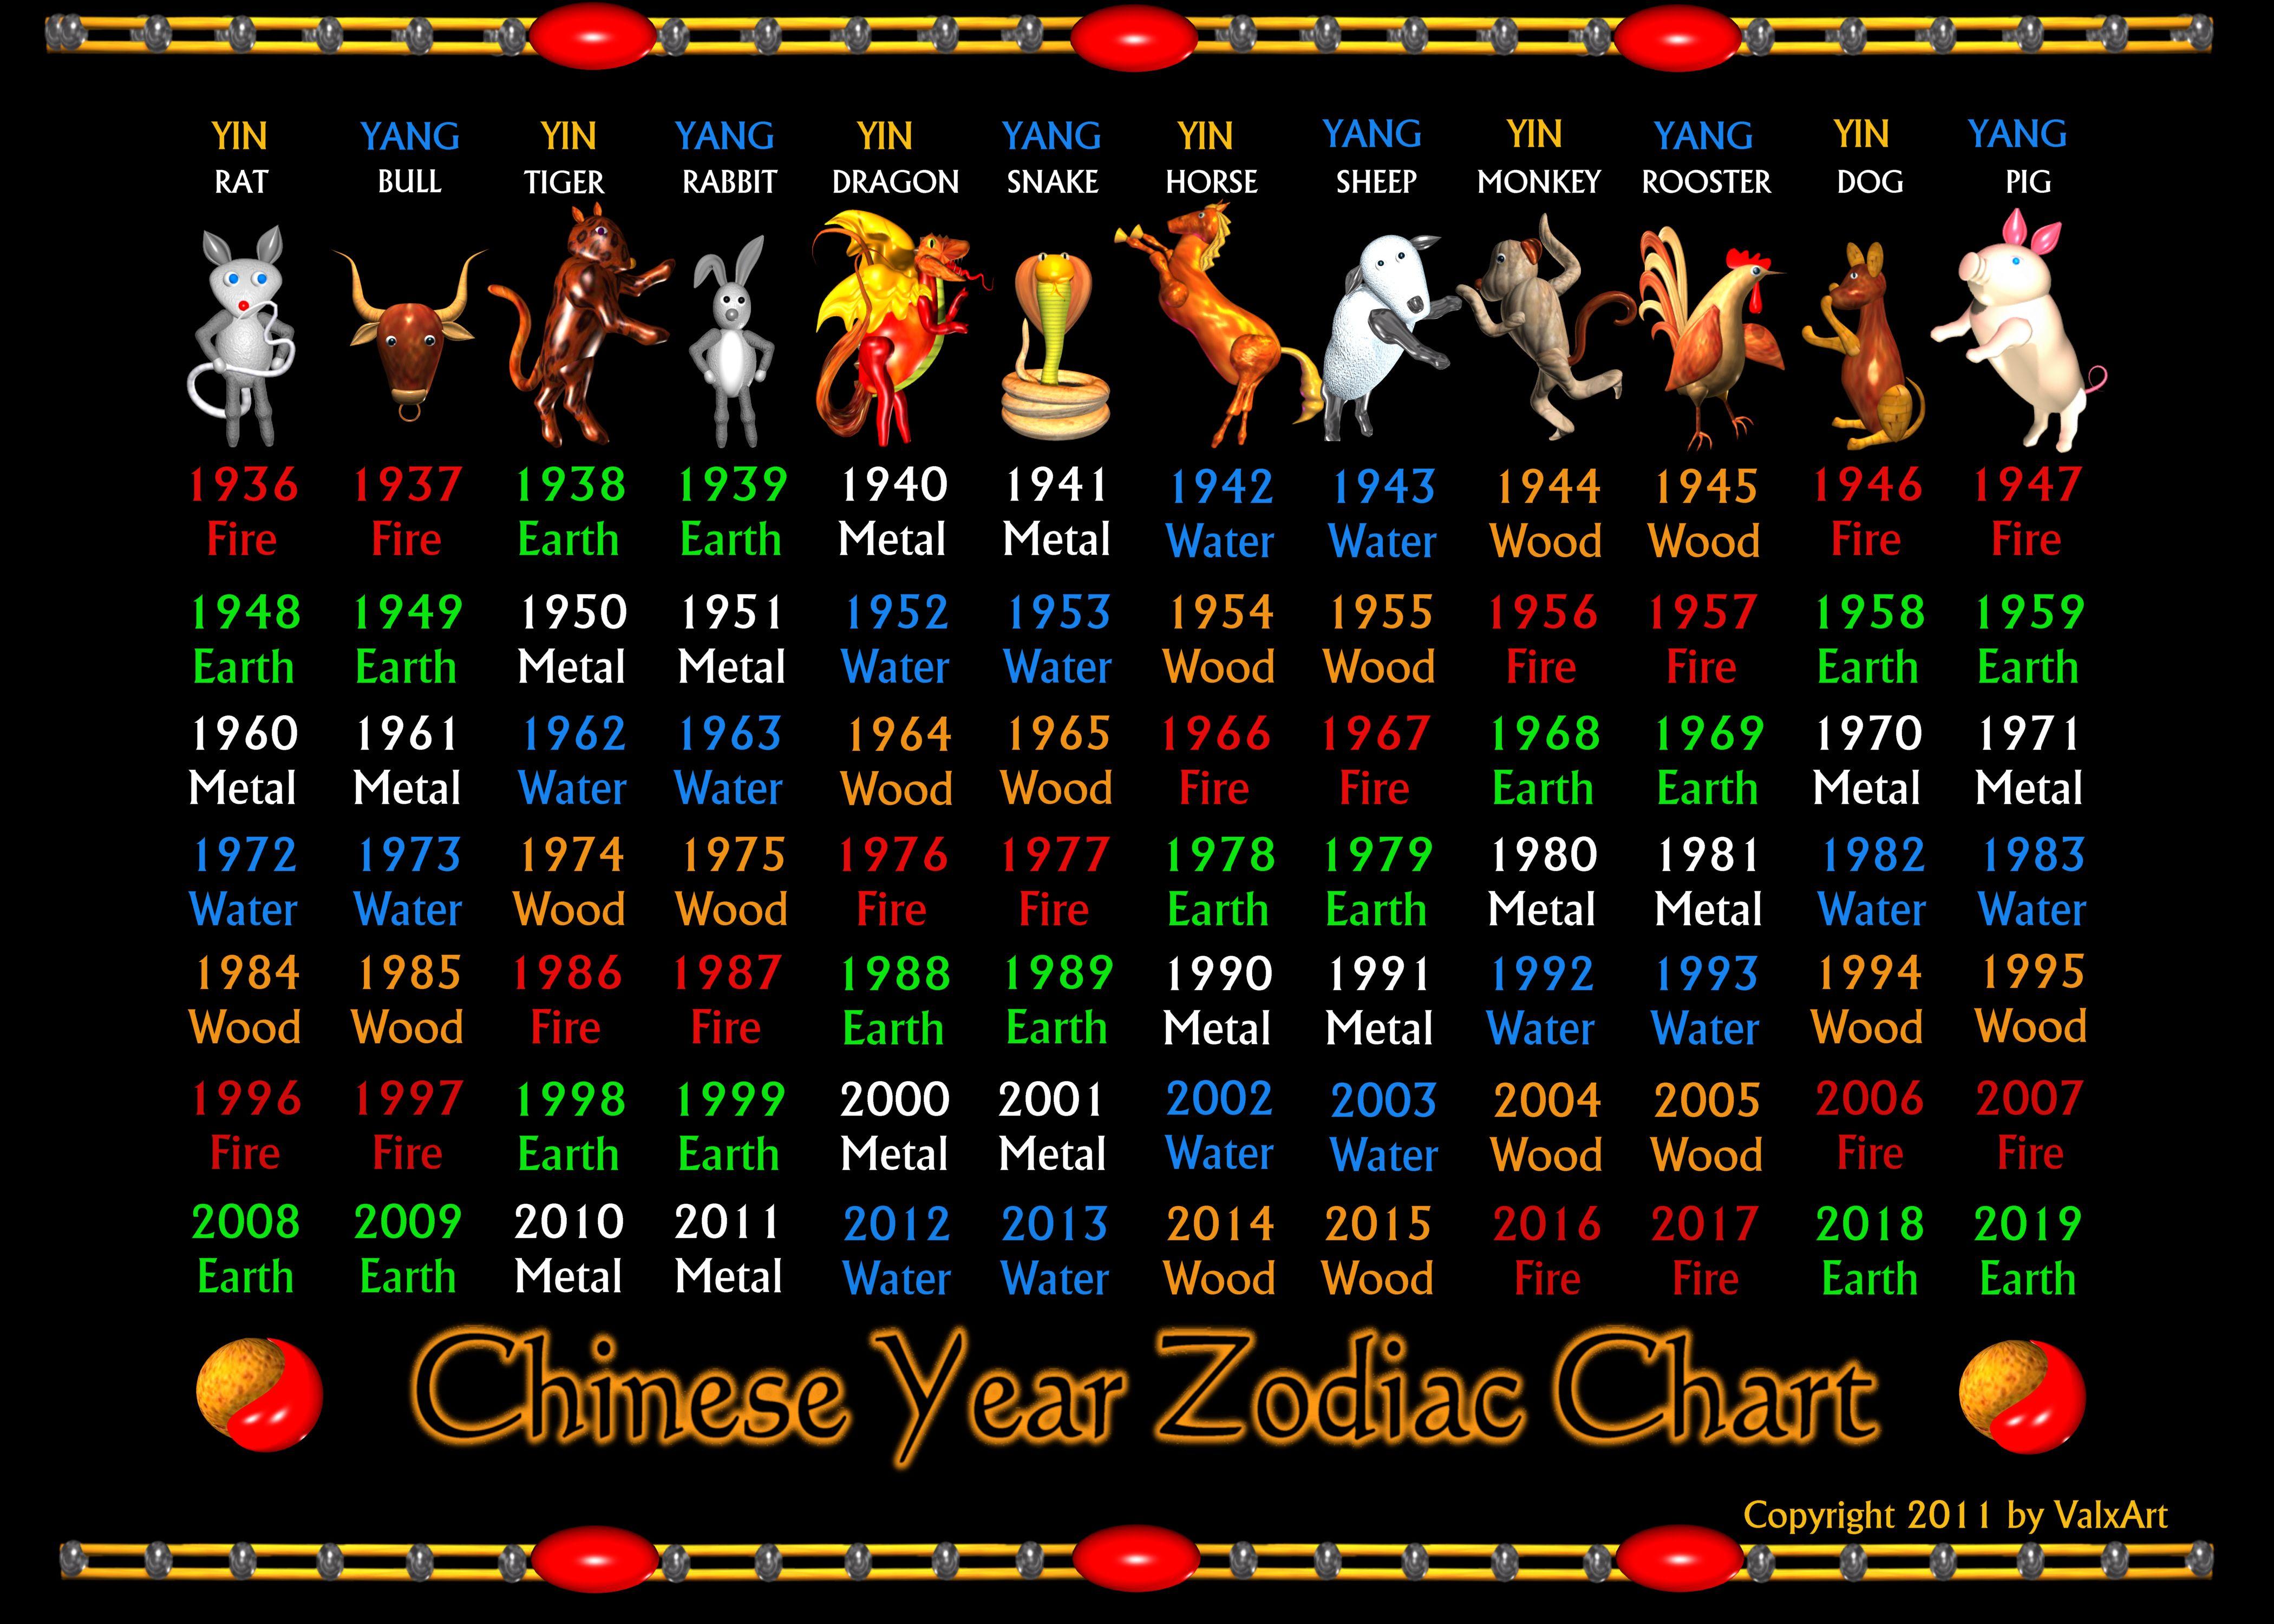 ValxArt Chinese zodiac poster 1936 to 2019